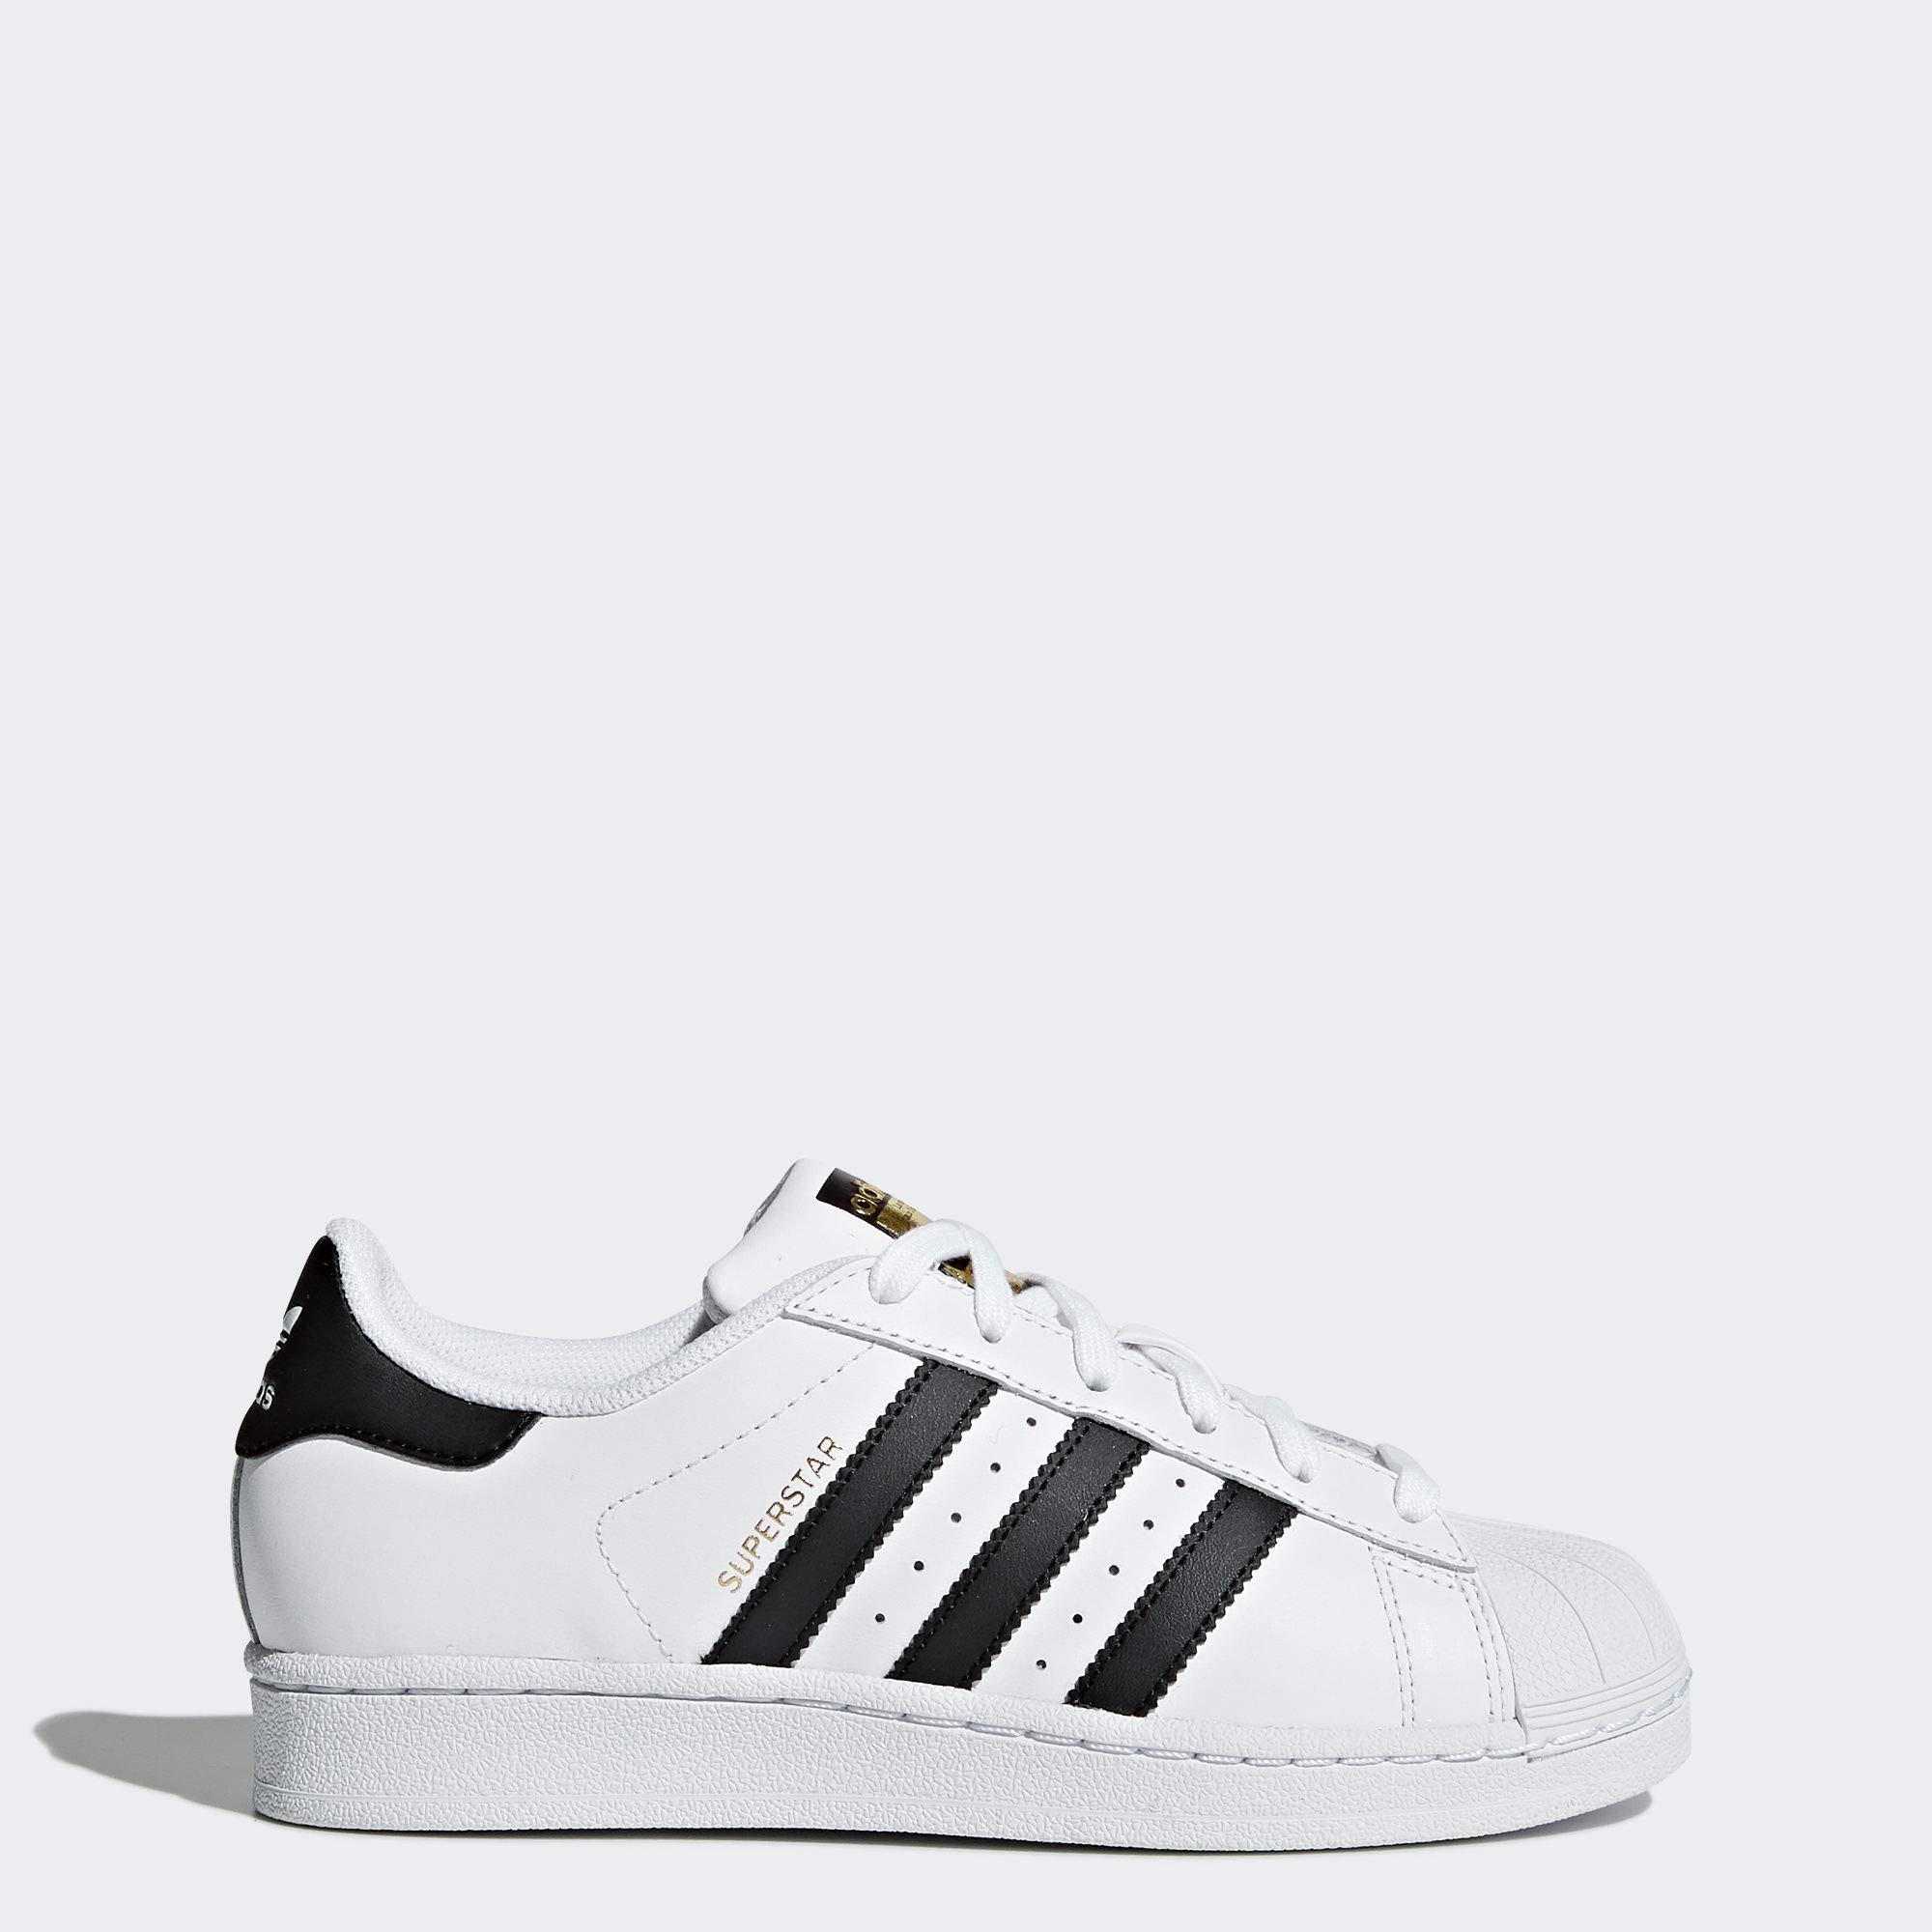 adidas Originals Kids' Superstars Running Shoe, WhiteBlack, 4 M US